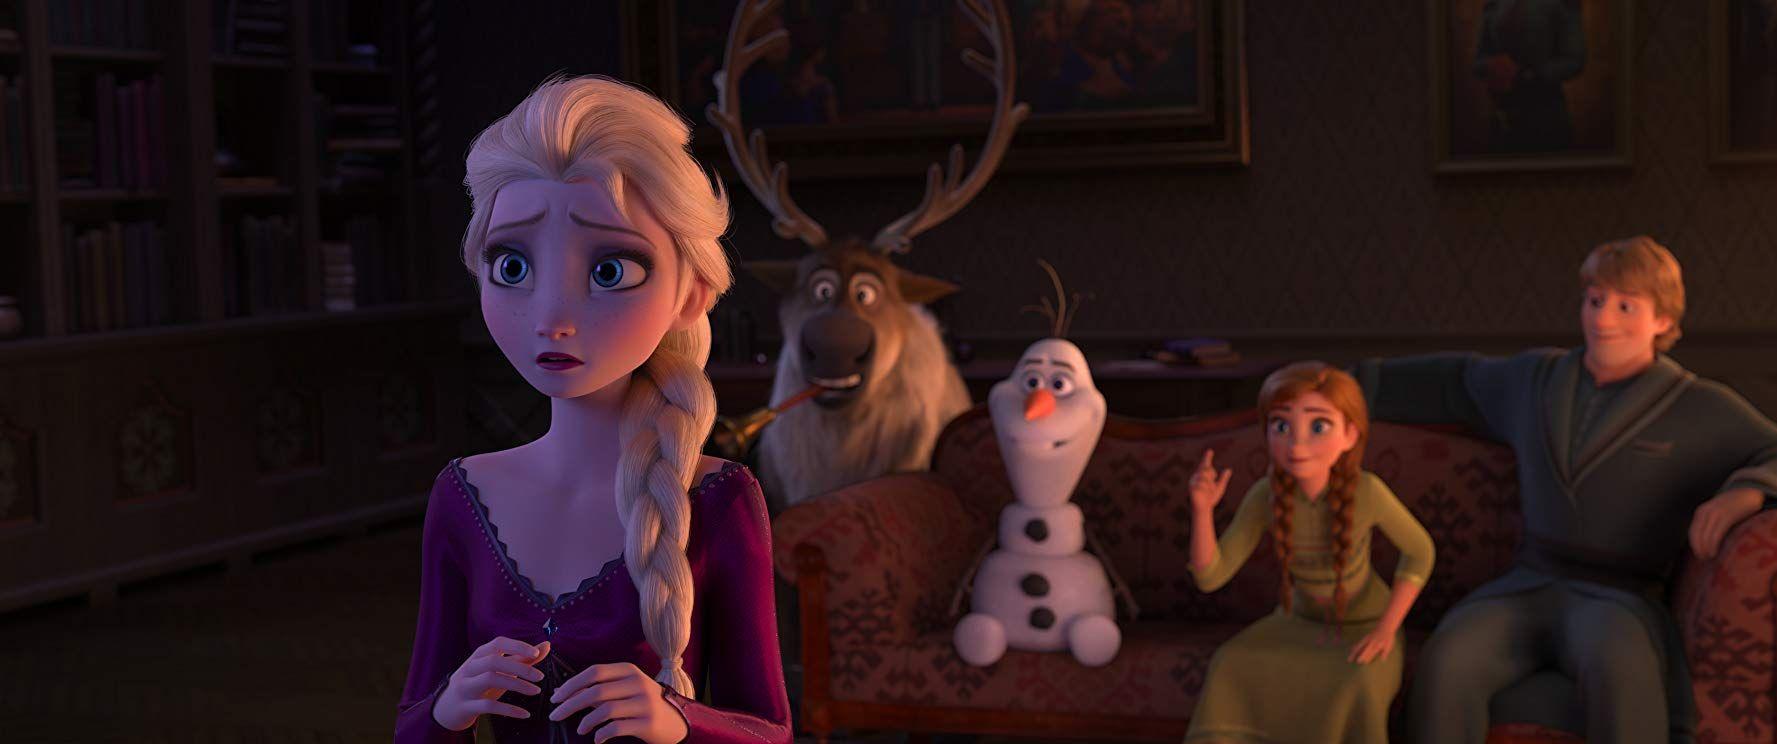 W A T C H Frozen Two 2019 For Free Online Disney Plus Walt Disney Animation Studios Walt Disney Pictures